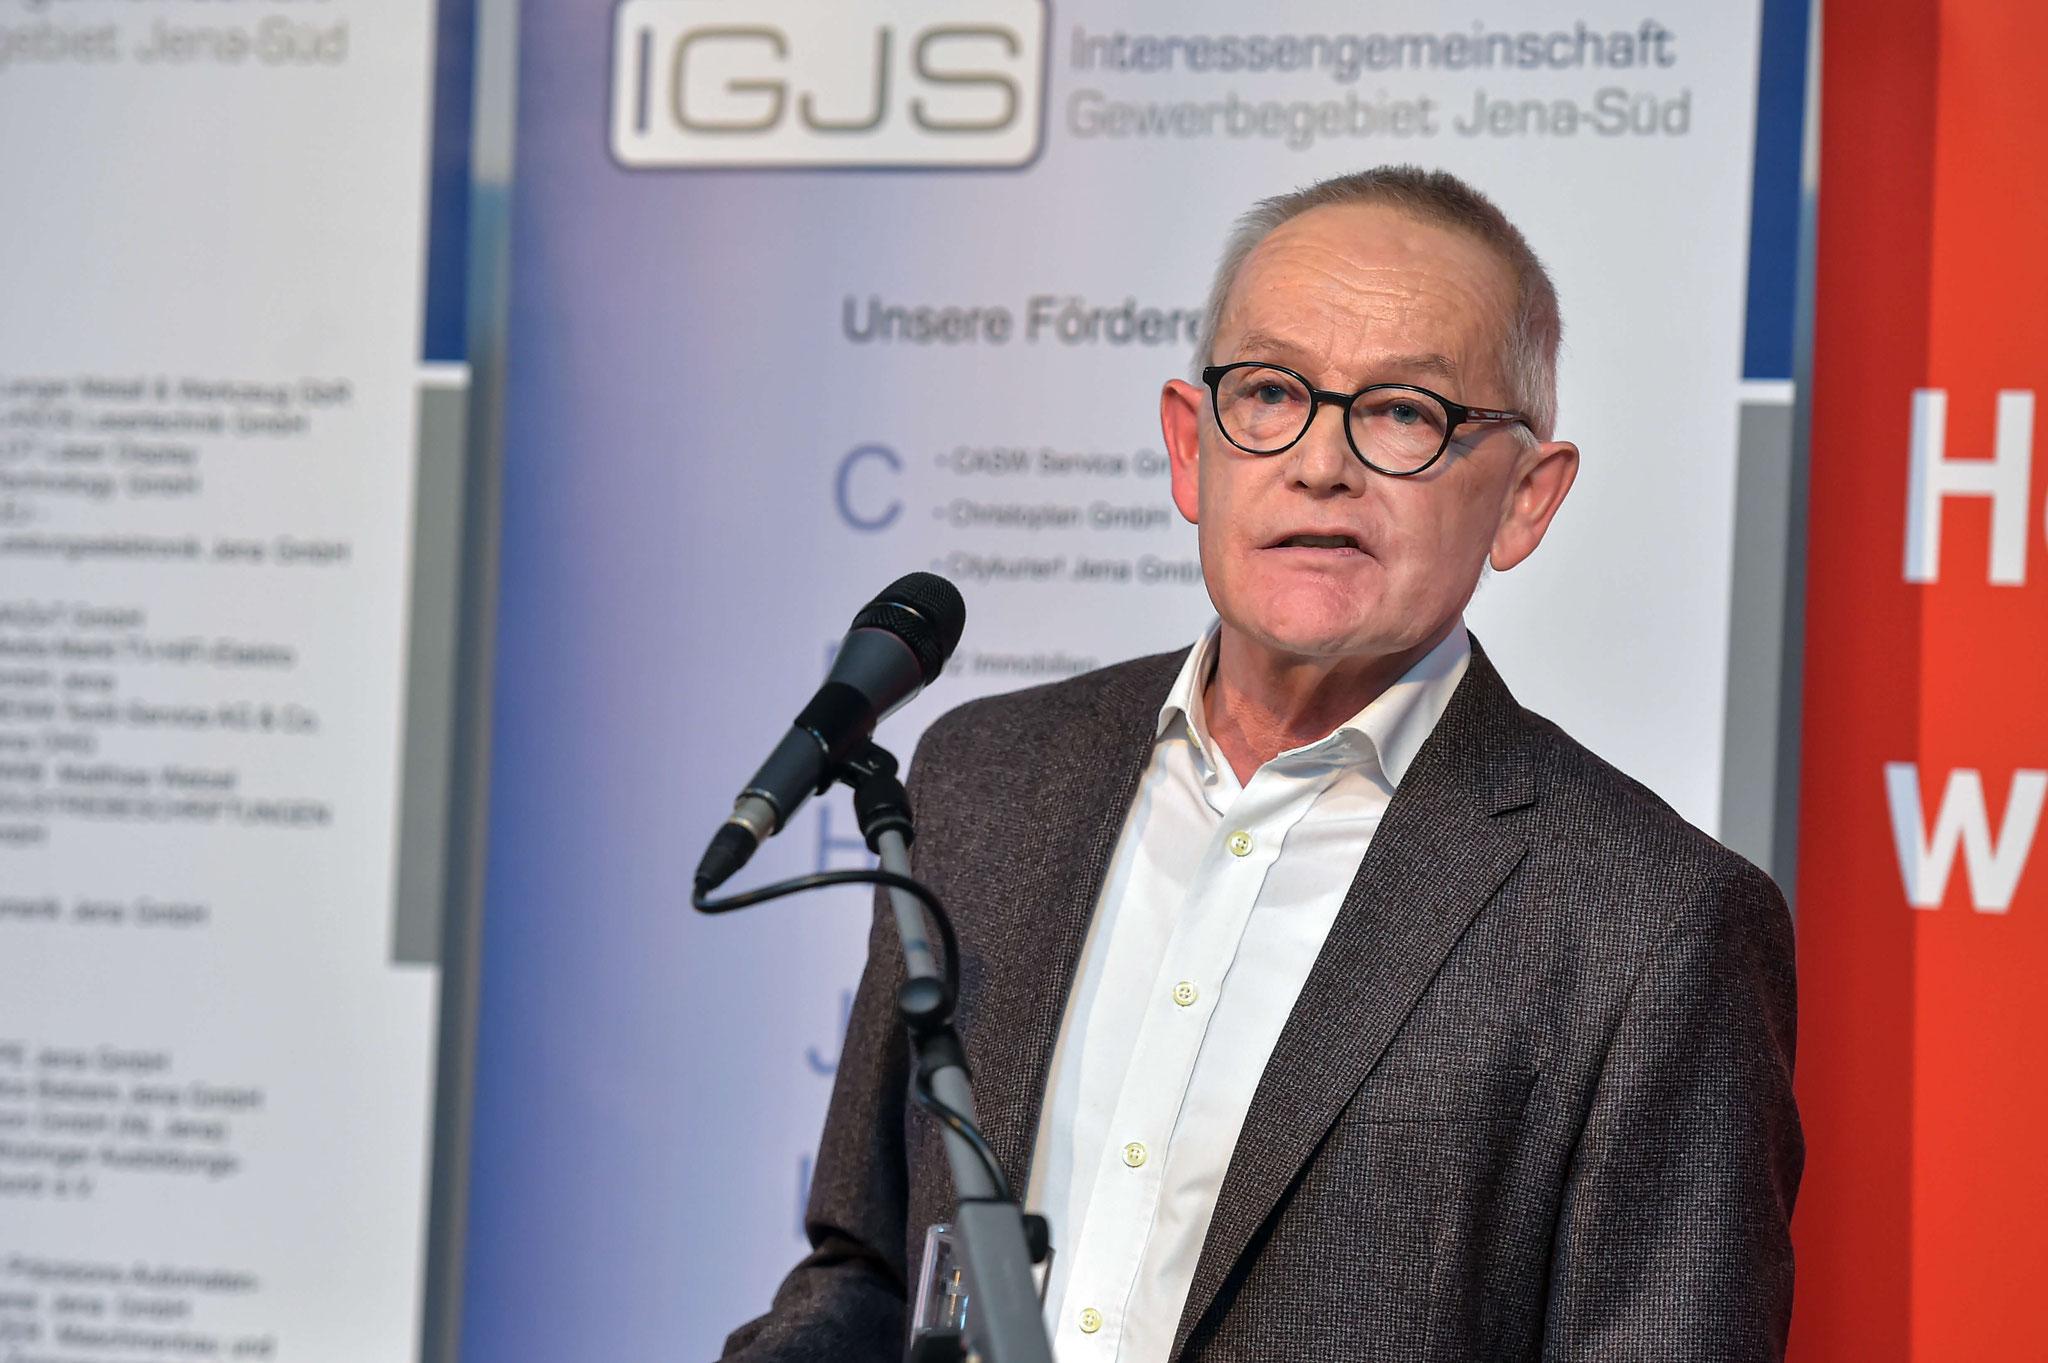 Gastredner Prof. Dr. Evehard Holtmann